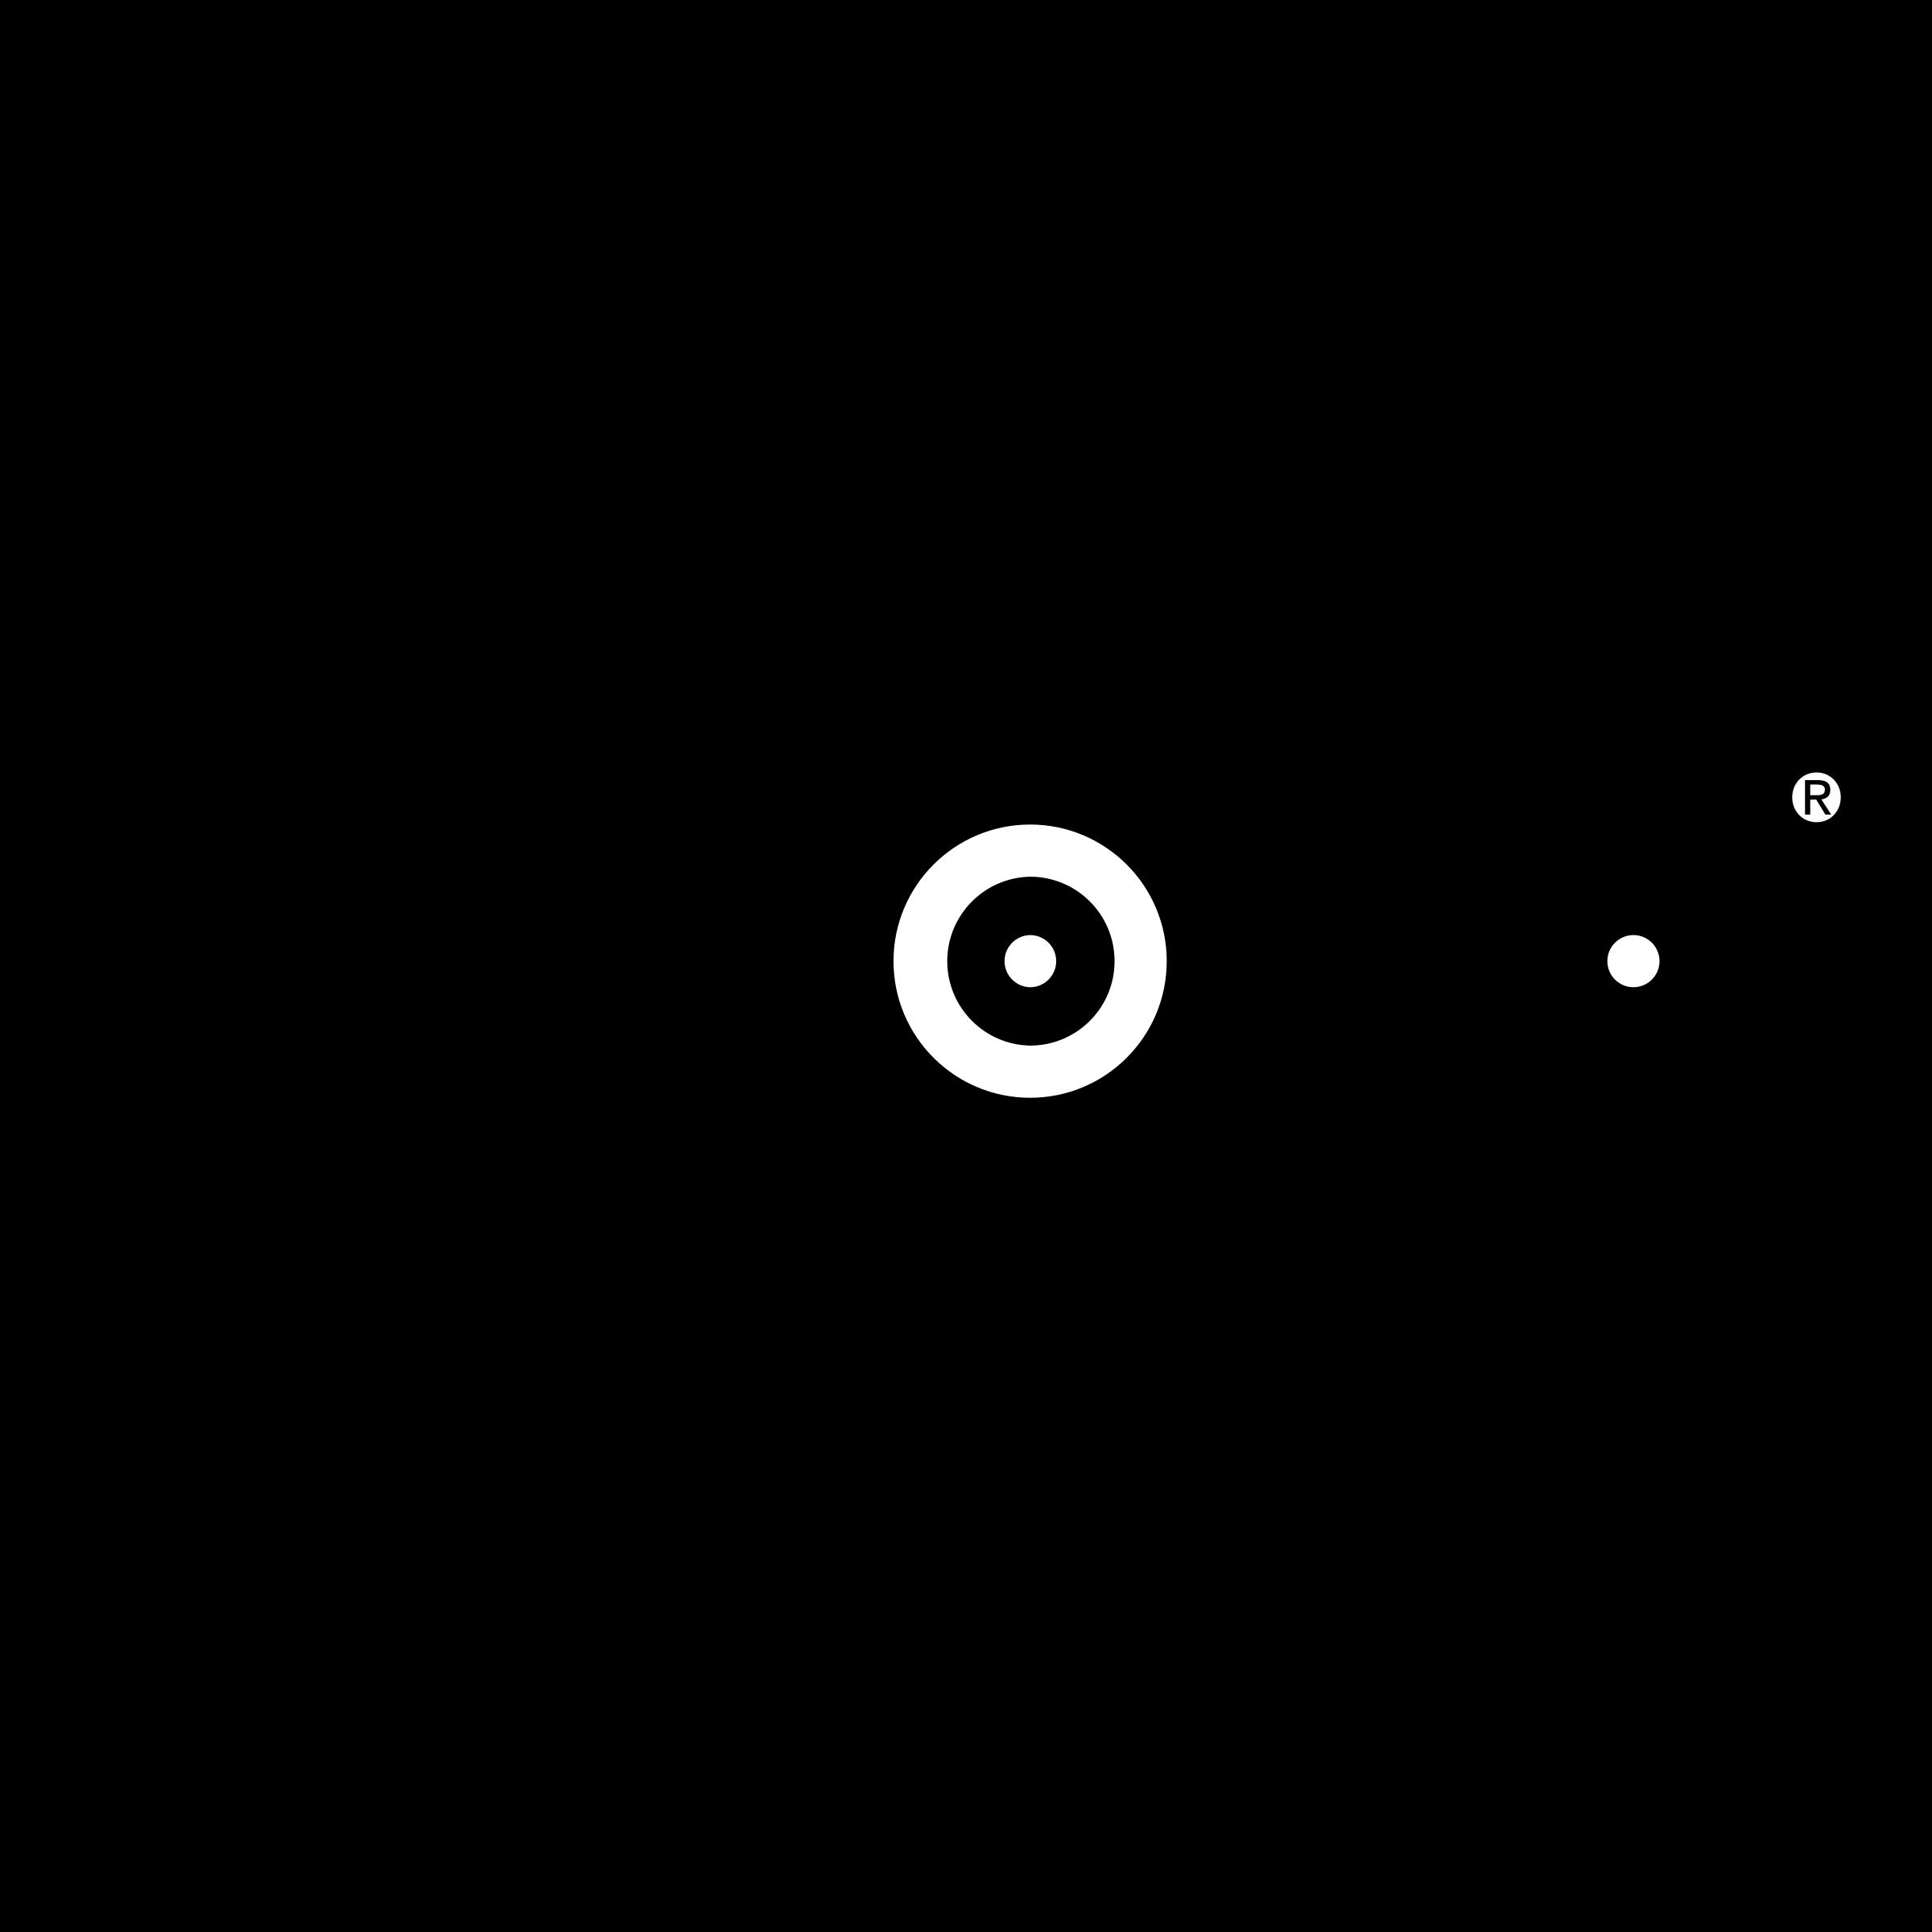 asolo-01-logo-png-transparent.png